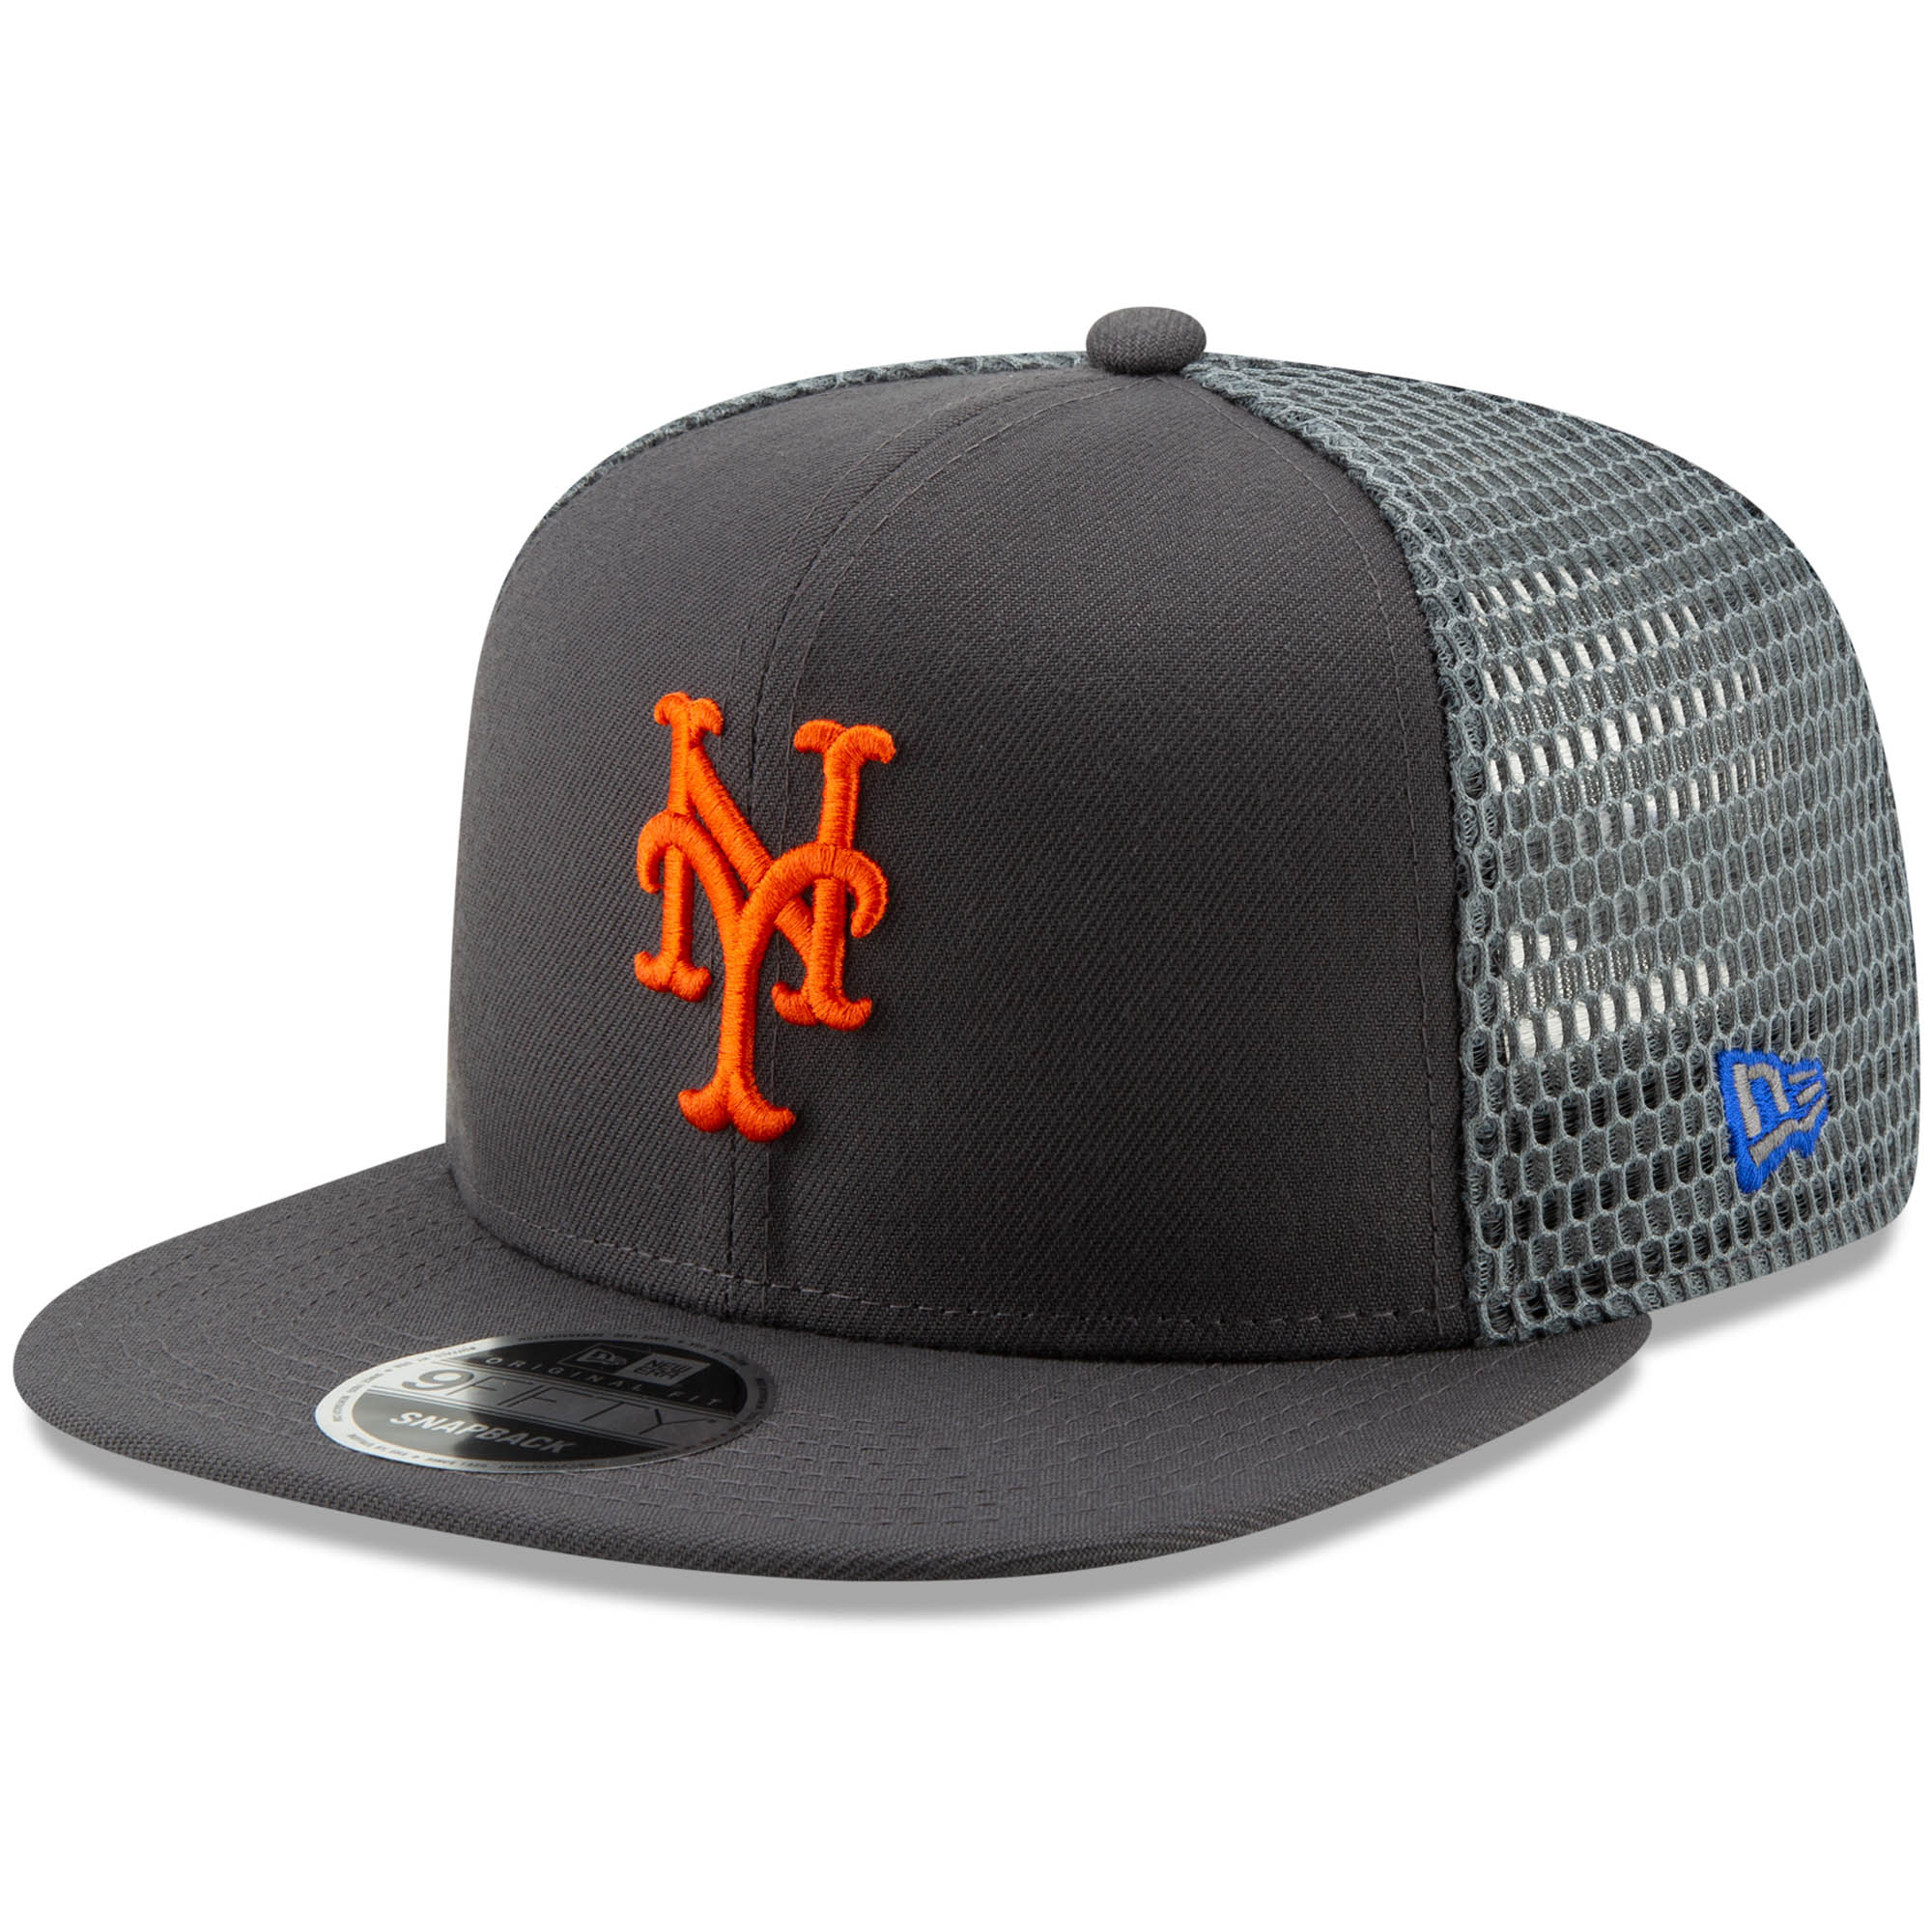 New York Mets New Era Mesh Fresh 9FIFTY Adjustable Snapback Hat - Graphite - OSFA